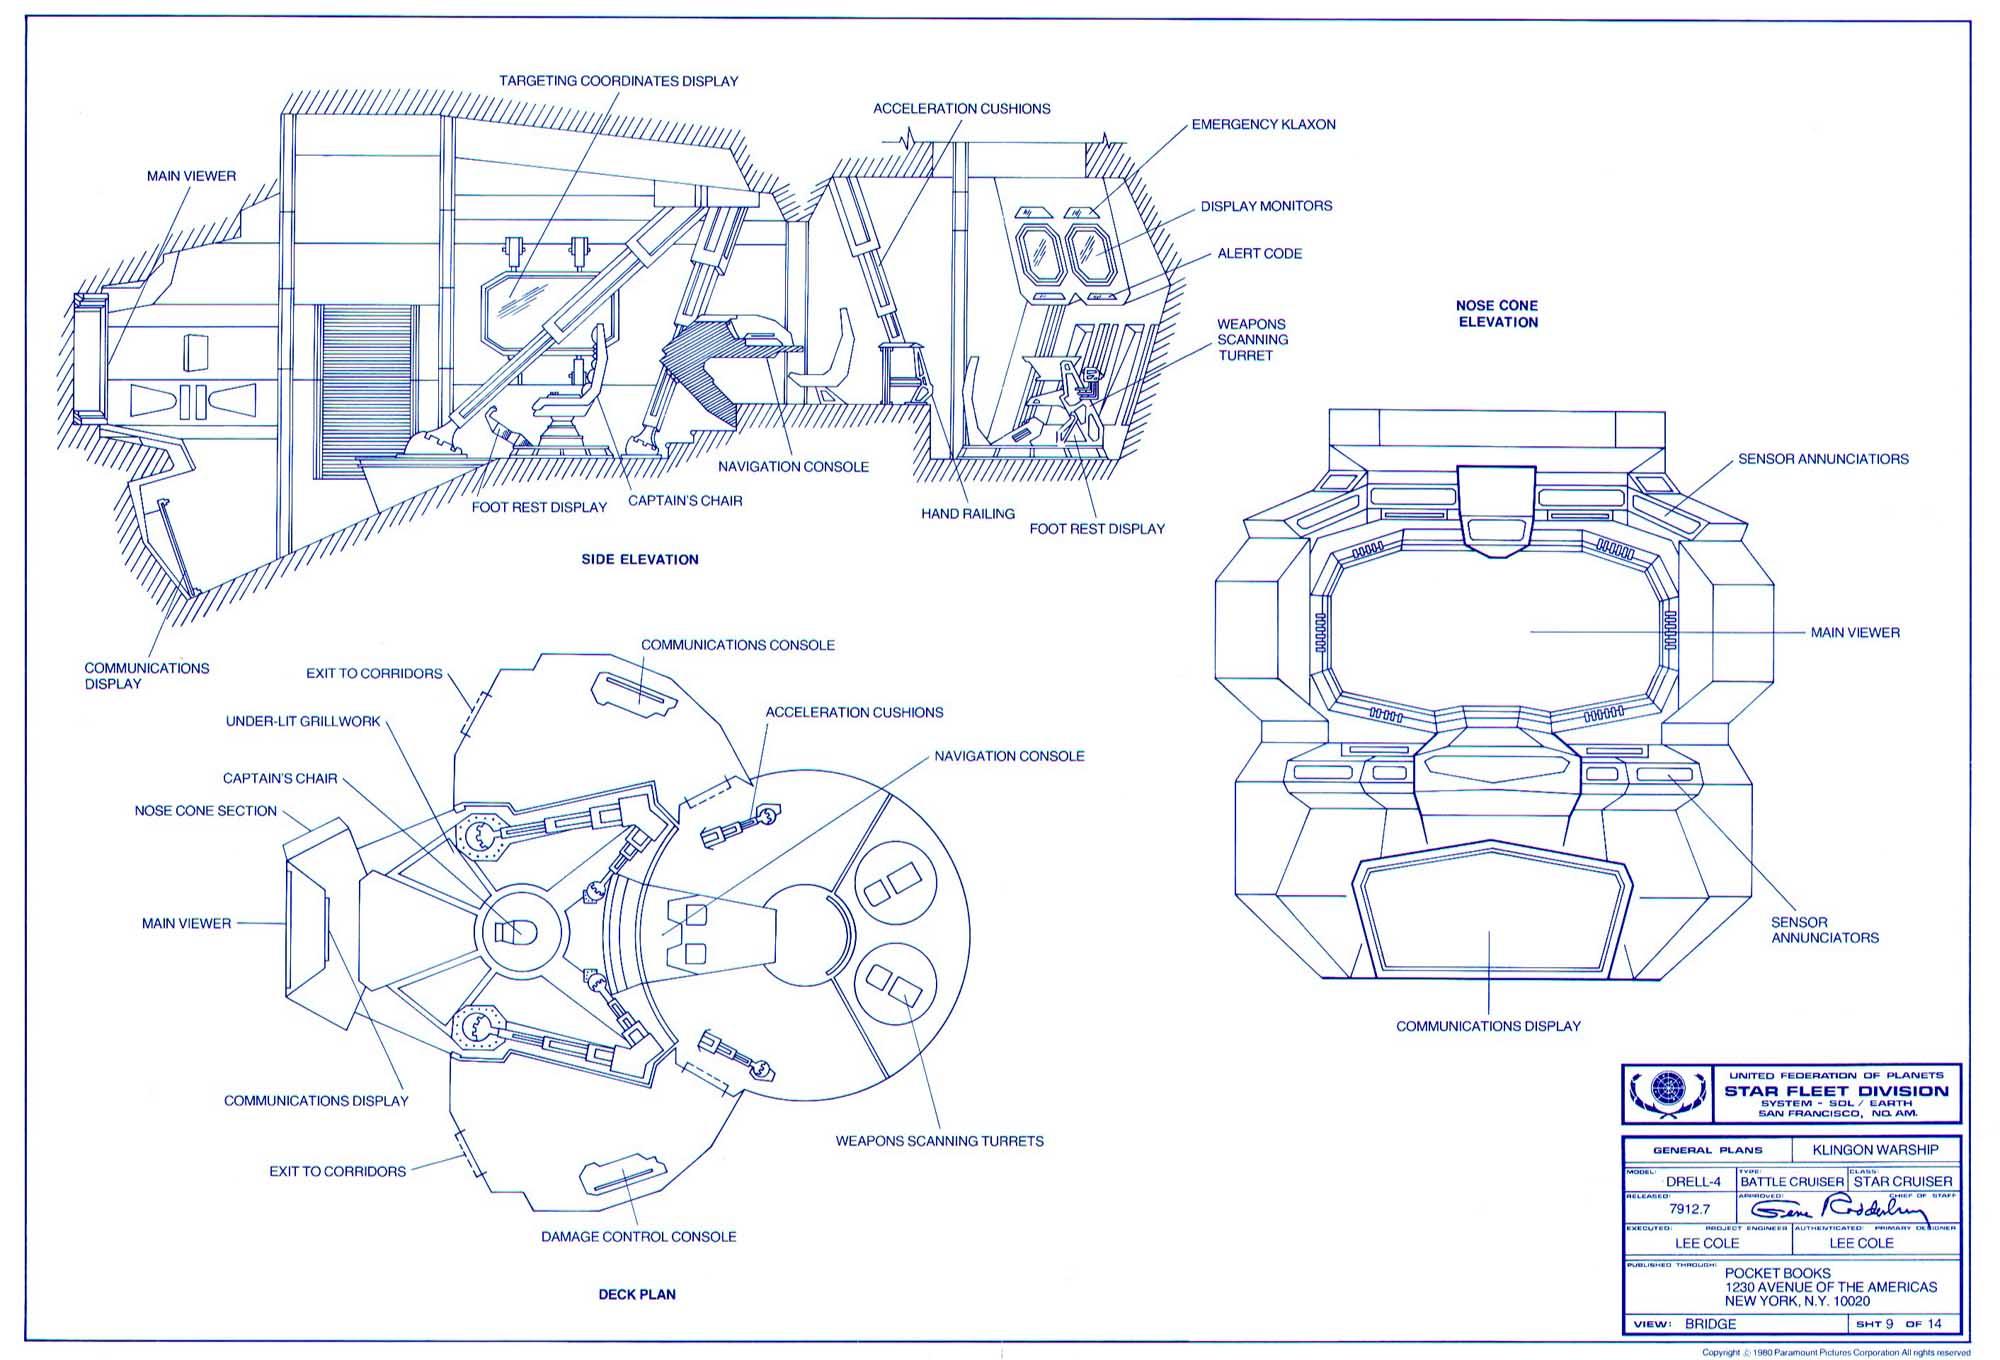 Cargo Ship Blueprint : Trek lcars blueprint database general plans mk xii robot